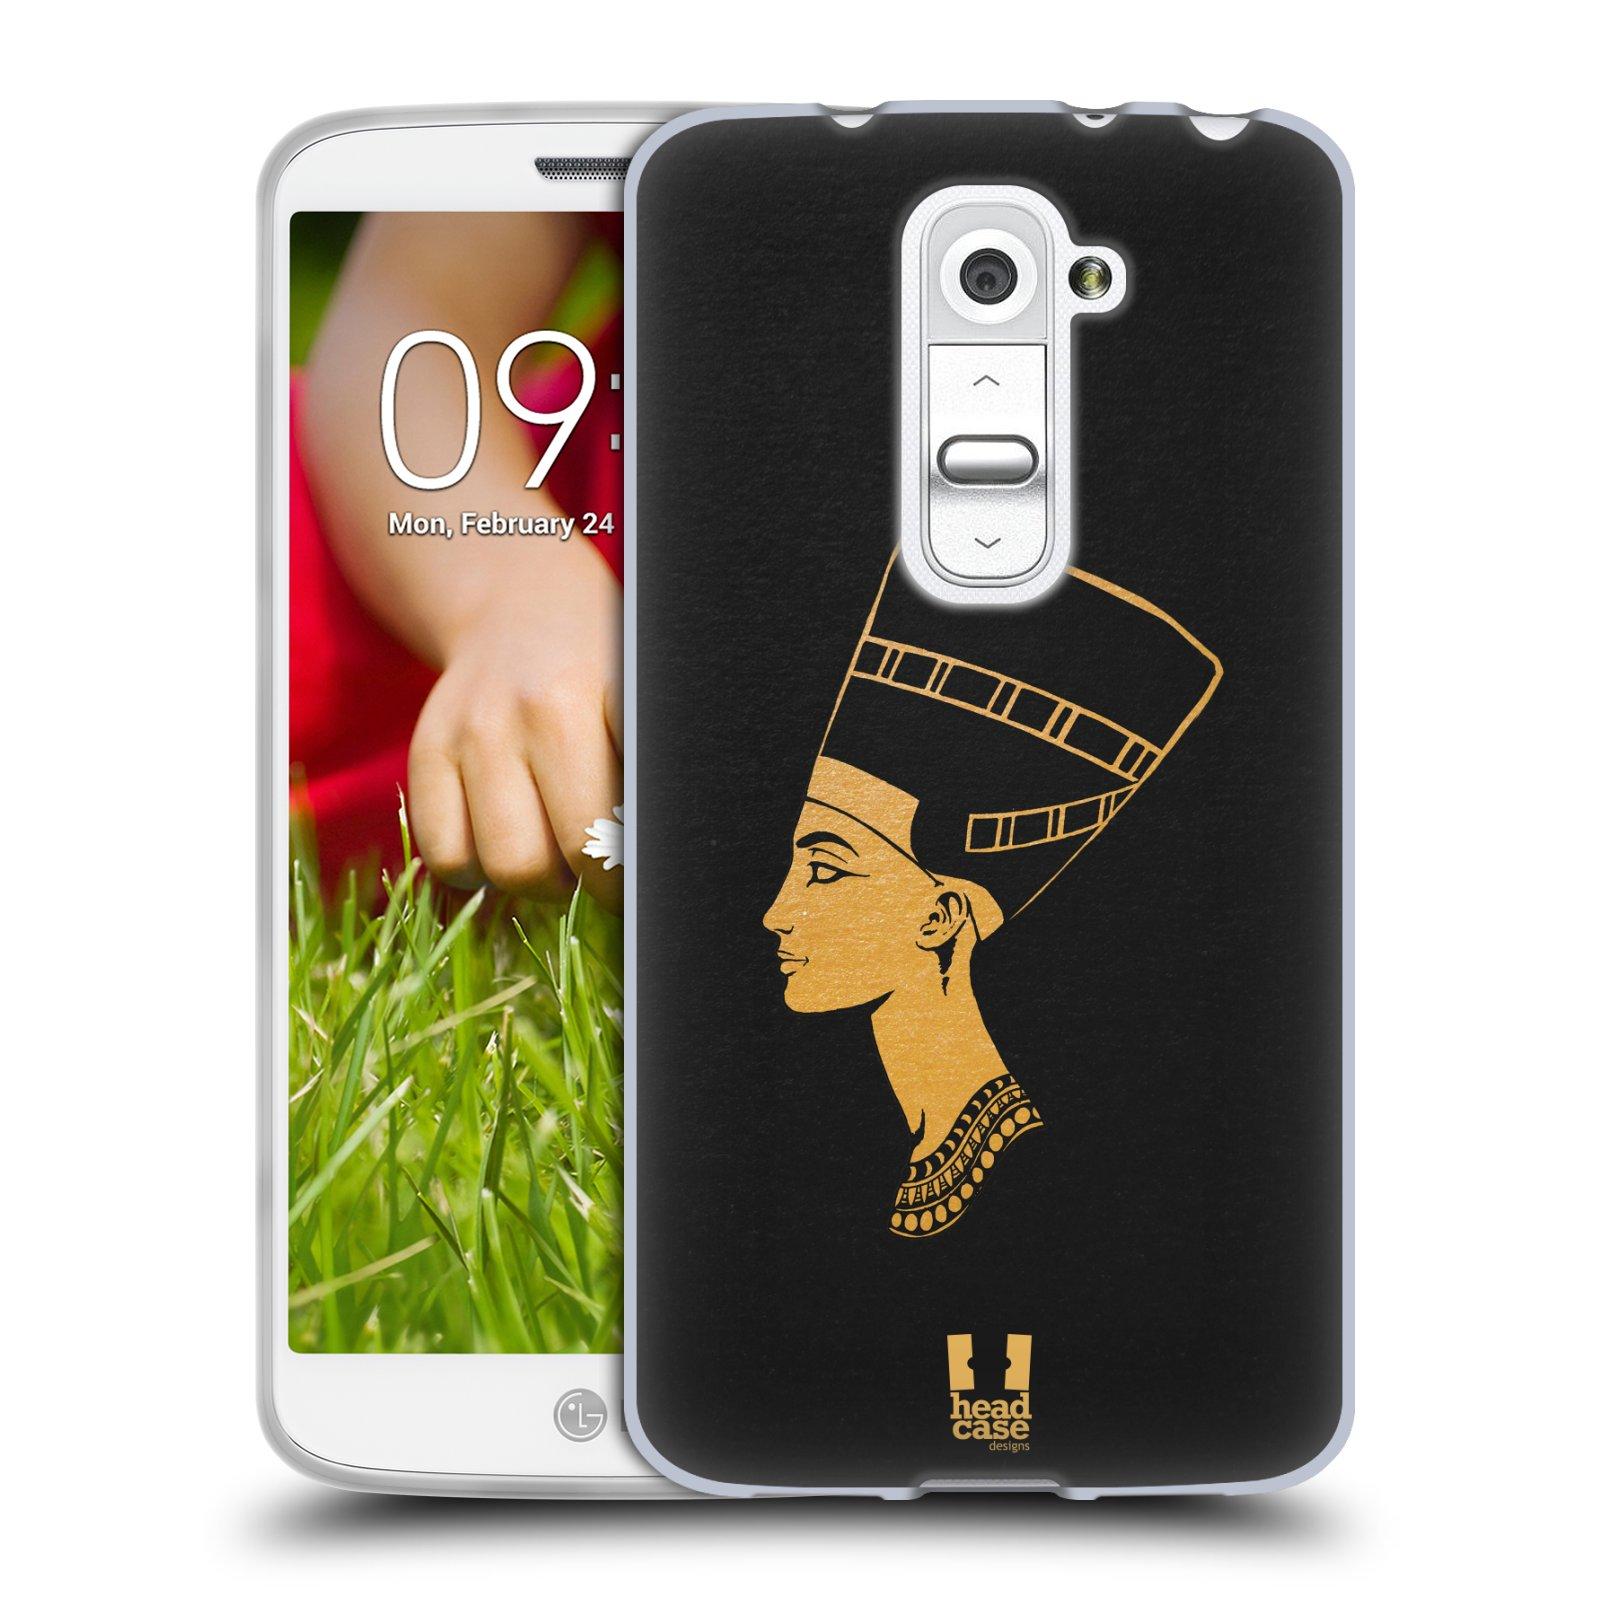 Silikonové pouzdro na mobil LG G2 Mini HEAD CASE EGYPT NEFERTITI (Silikonový kryt či obal na mobilní telefon LG G2 Mini D620)